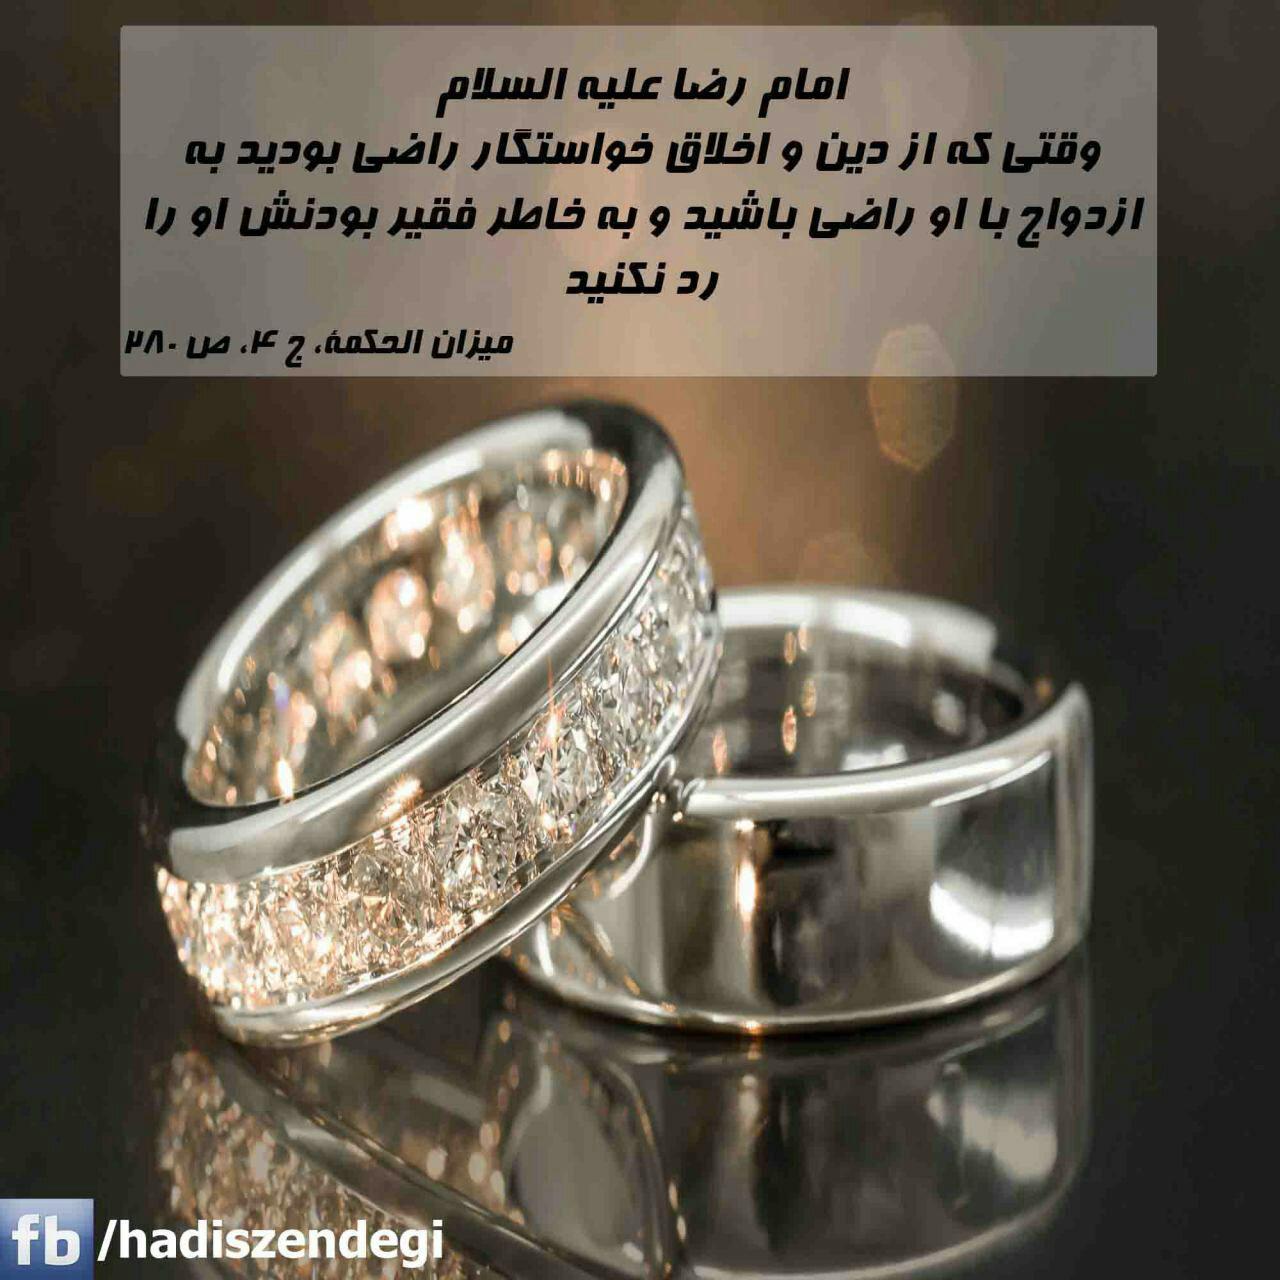 دین و اخلاق خواستگار